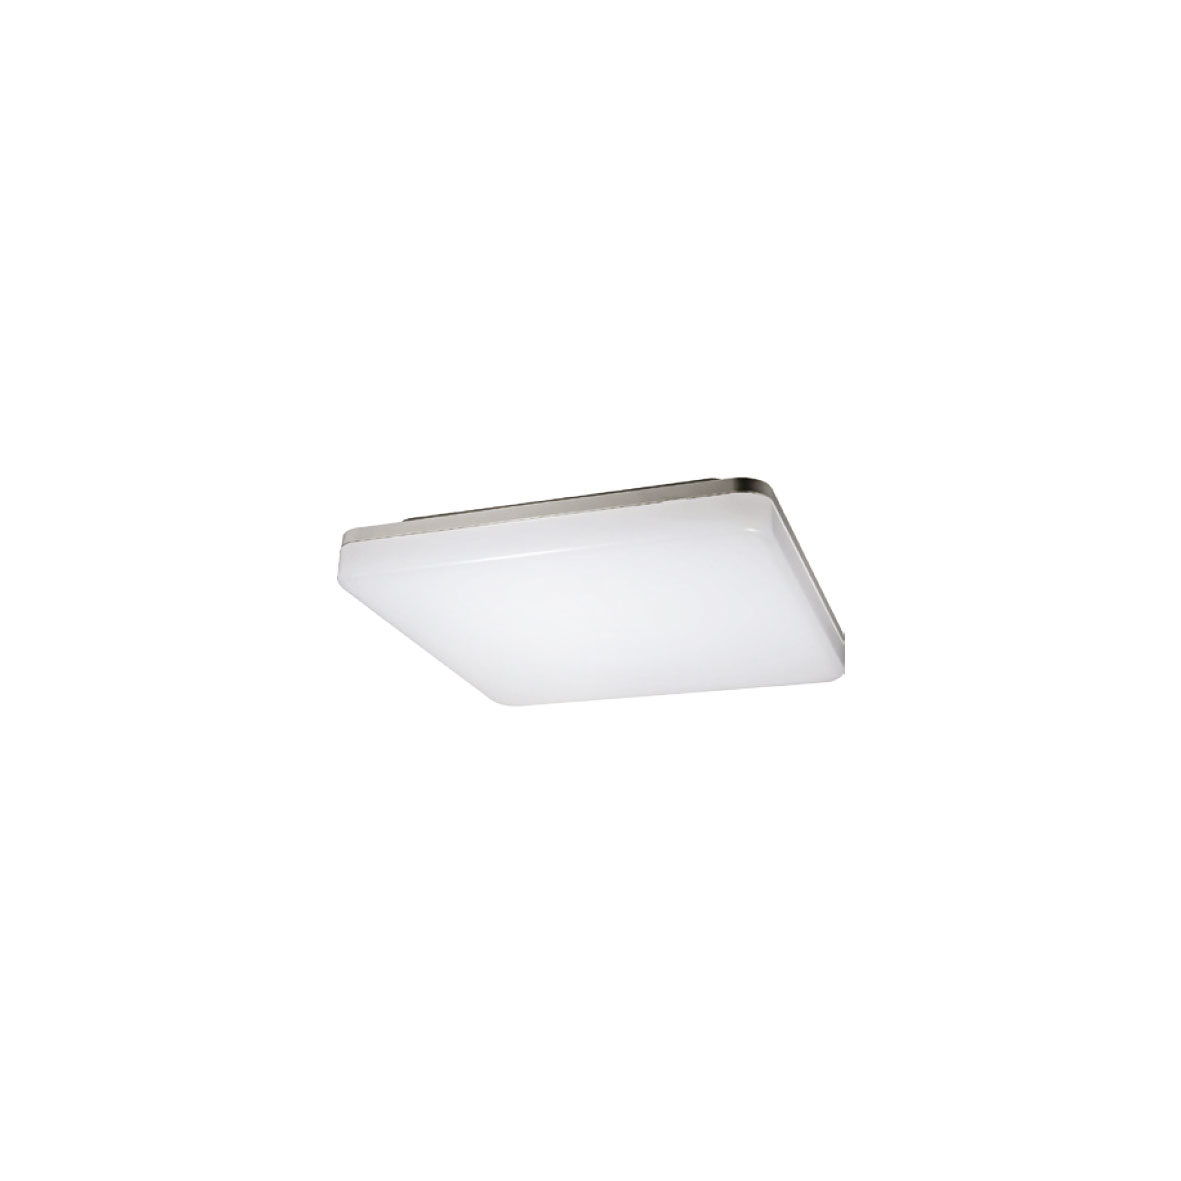 چراغ سقفى رو کار-SH-280S-ND